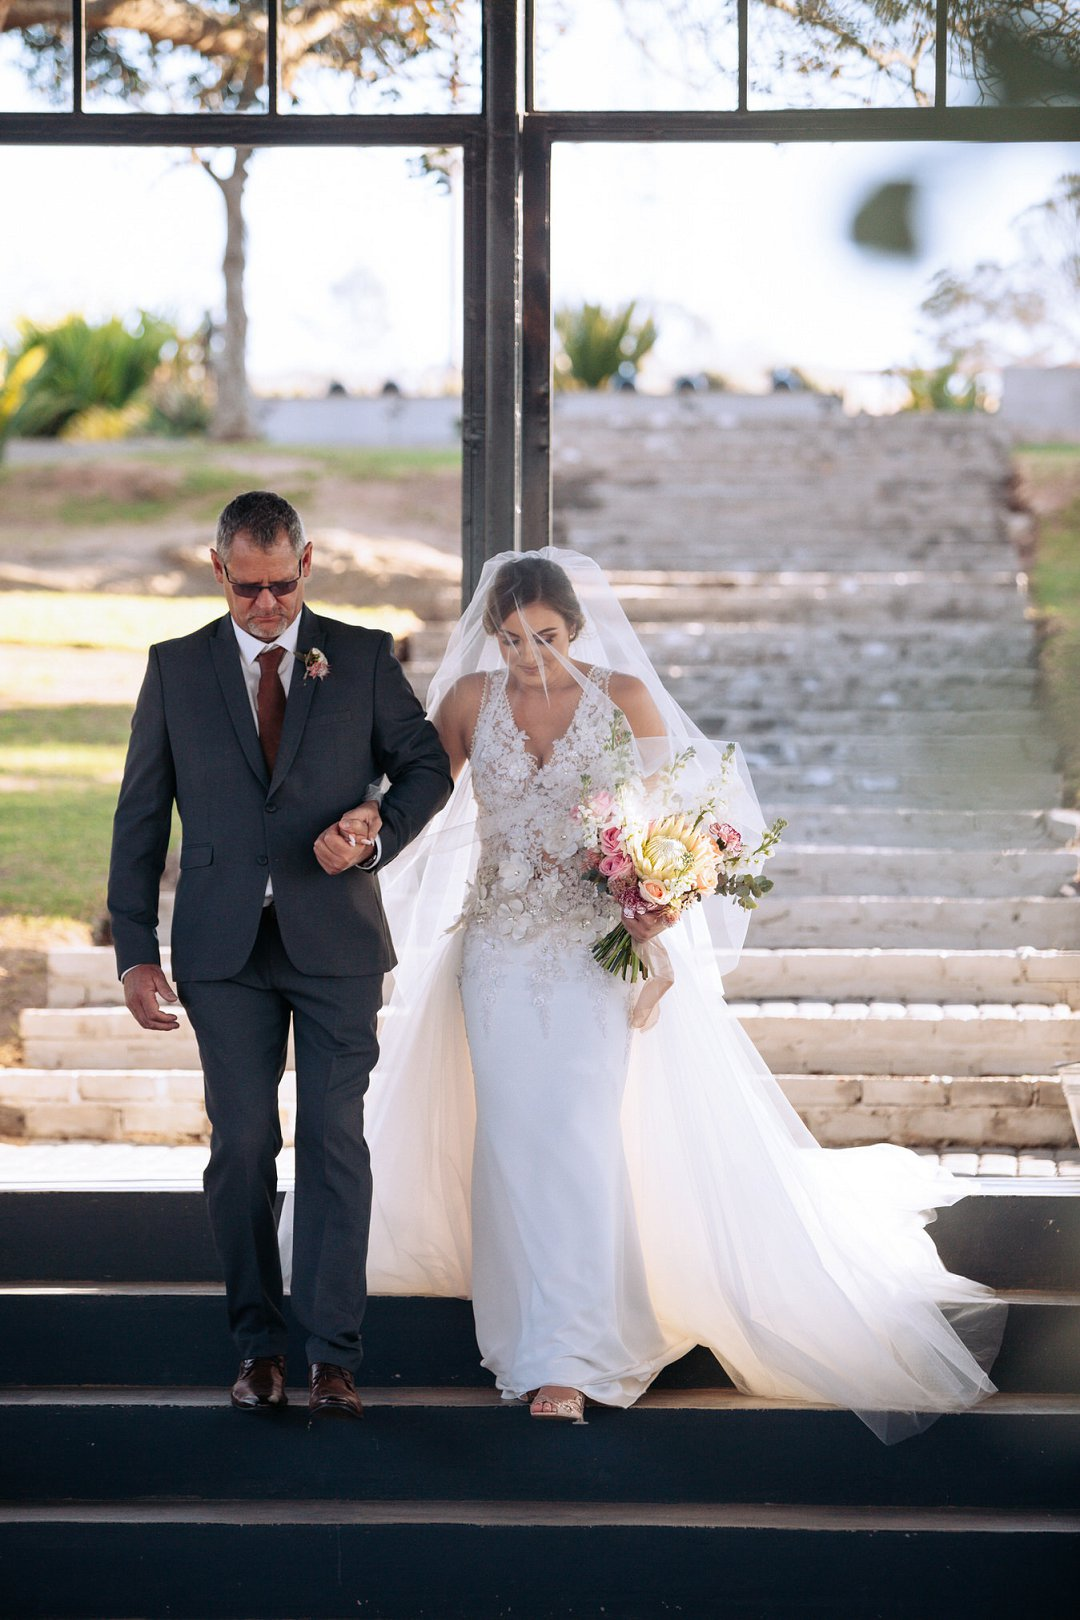 Wedding Venues in Mpumalanga